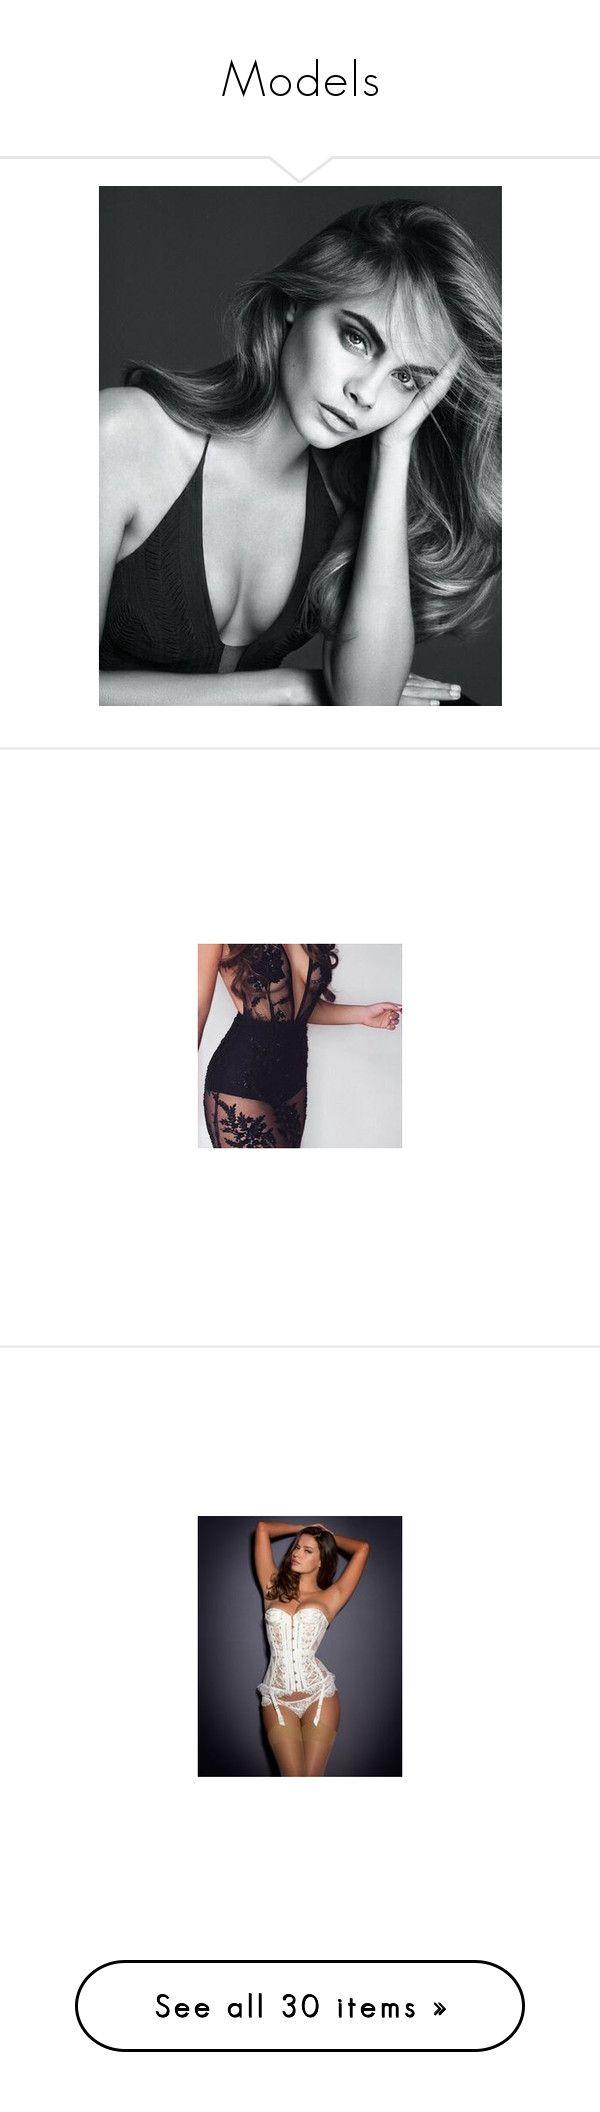 """Models"" by unicornkitty15 ❤ liked on Polyvore featuring intimates, sexy chemise, chemise lingerie, plus size lingerie, plus size chemise, sexy plus size lingerie, women's plus size lingerie, sexy lingerie, lingerie chemise and shapewear"